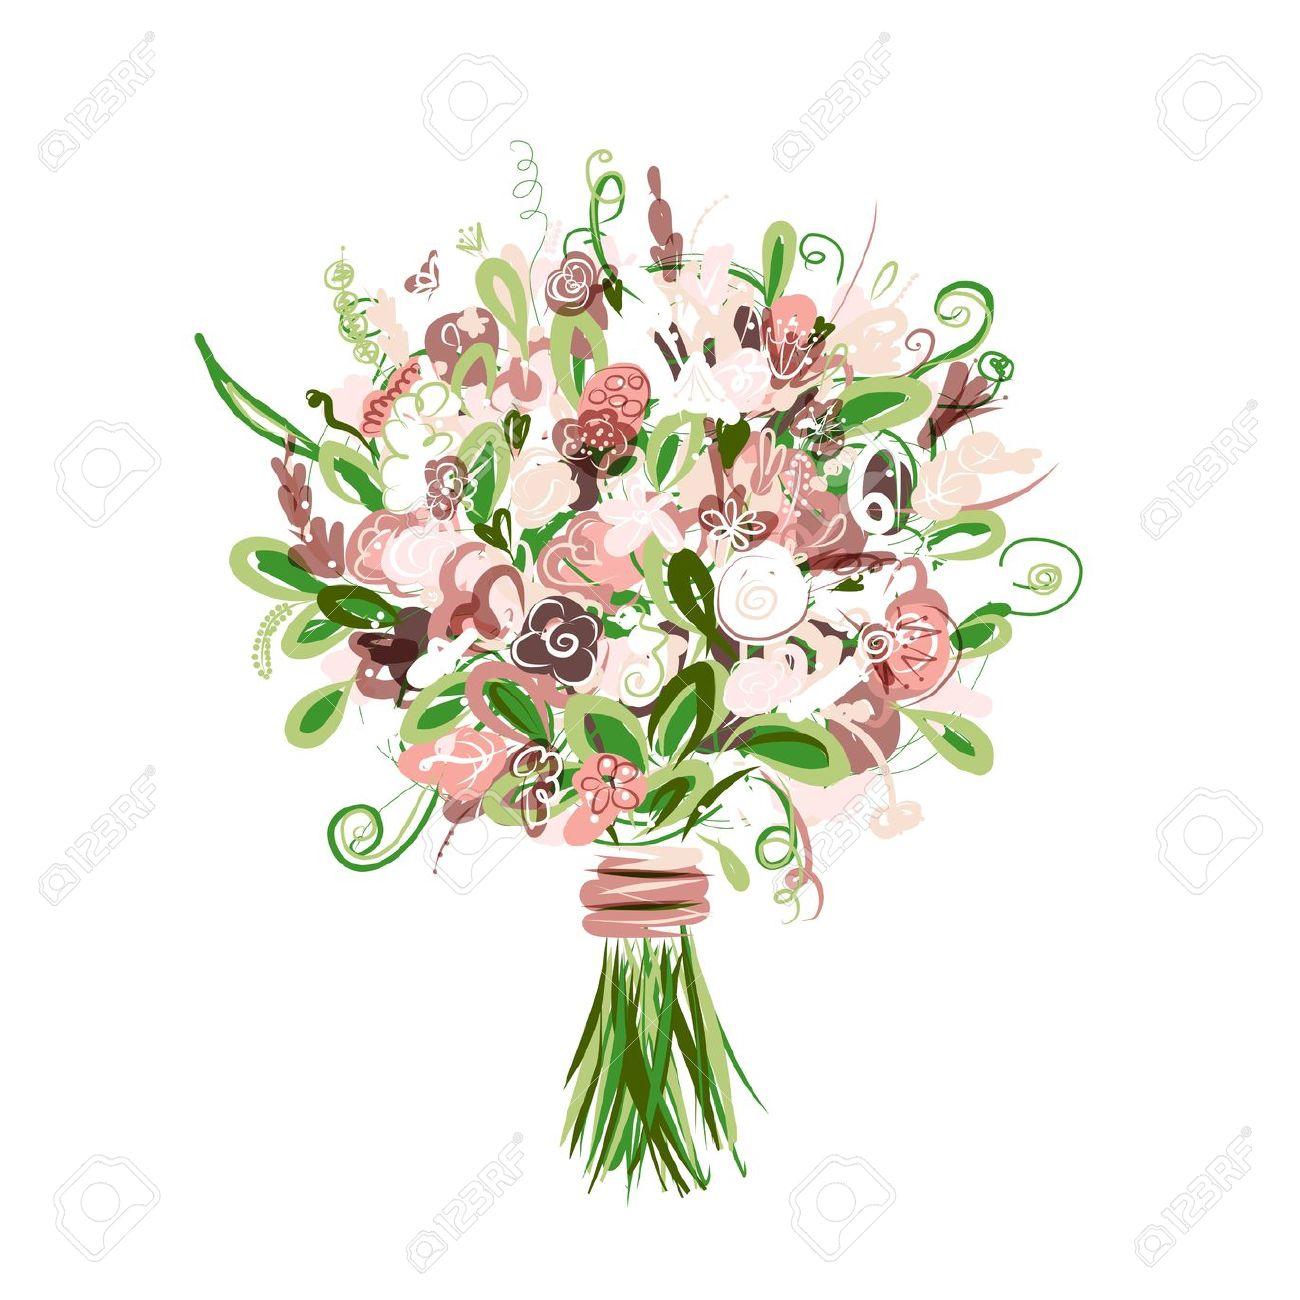 Bridal bouquet clipart 20 free Cliparts | Download images ...